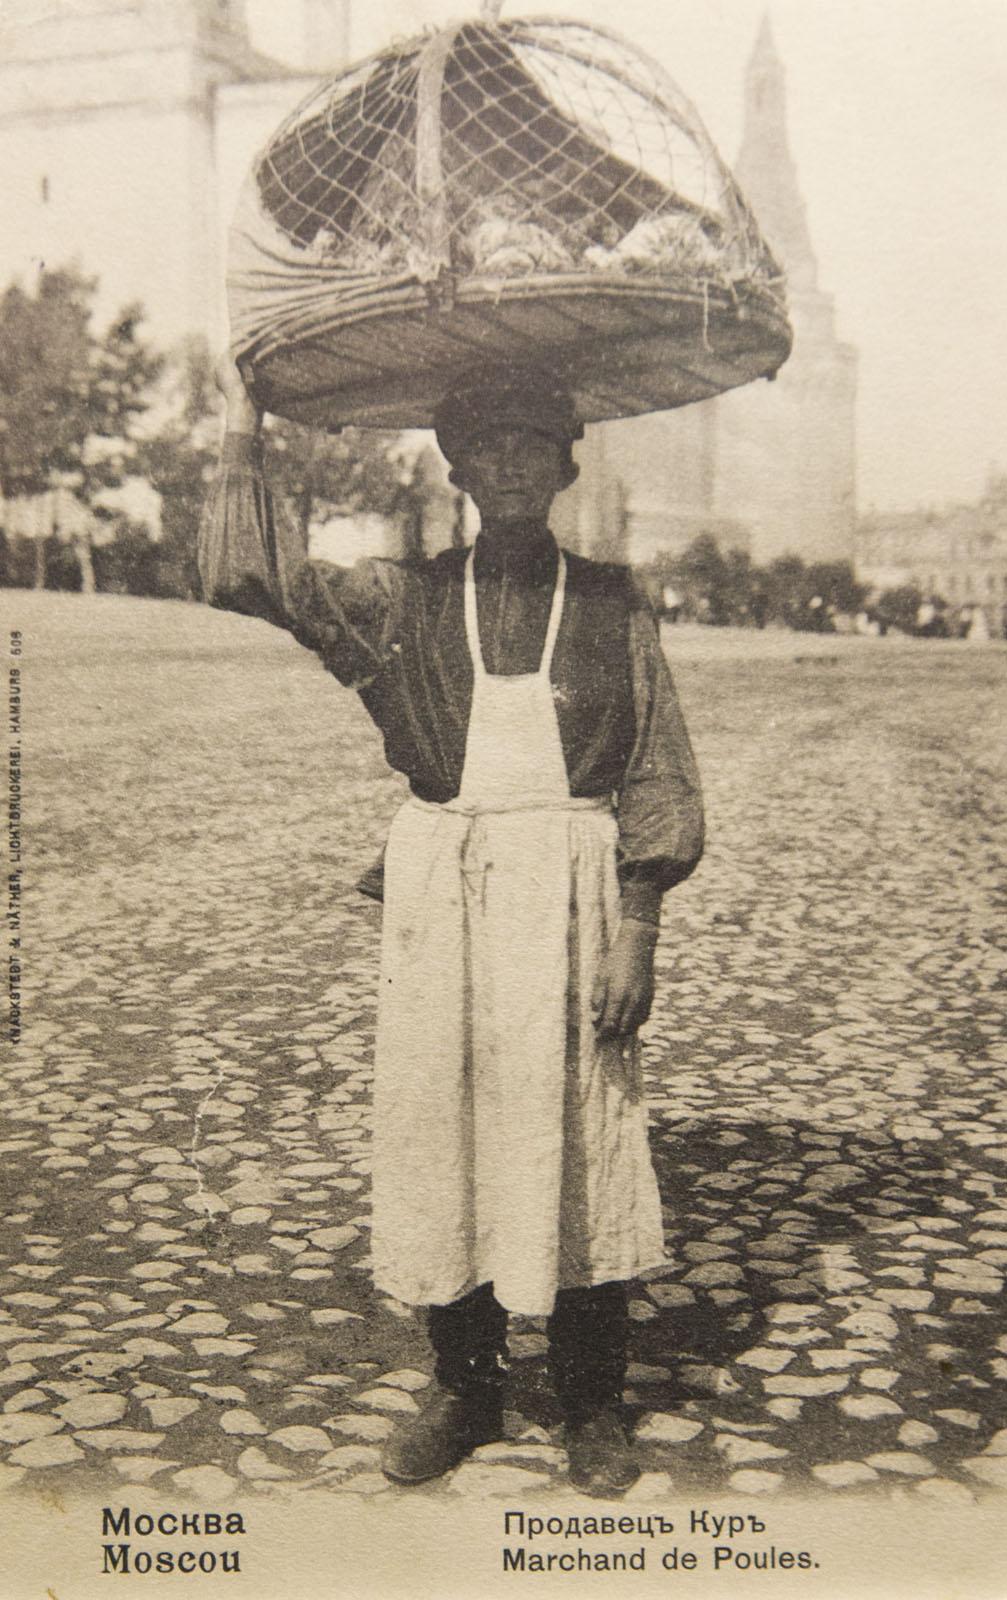 Фото №79939. Типы России. Продавец кур. Гамбург. 1903